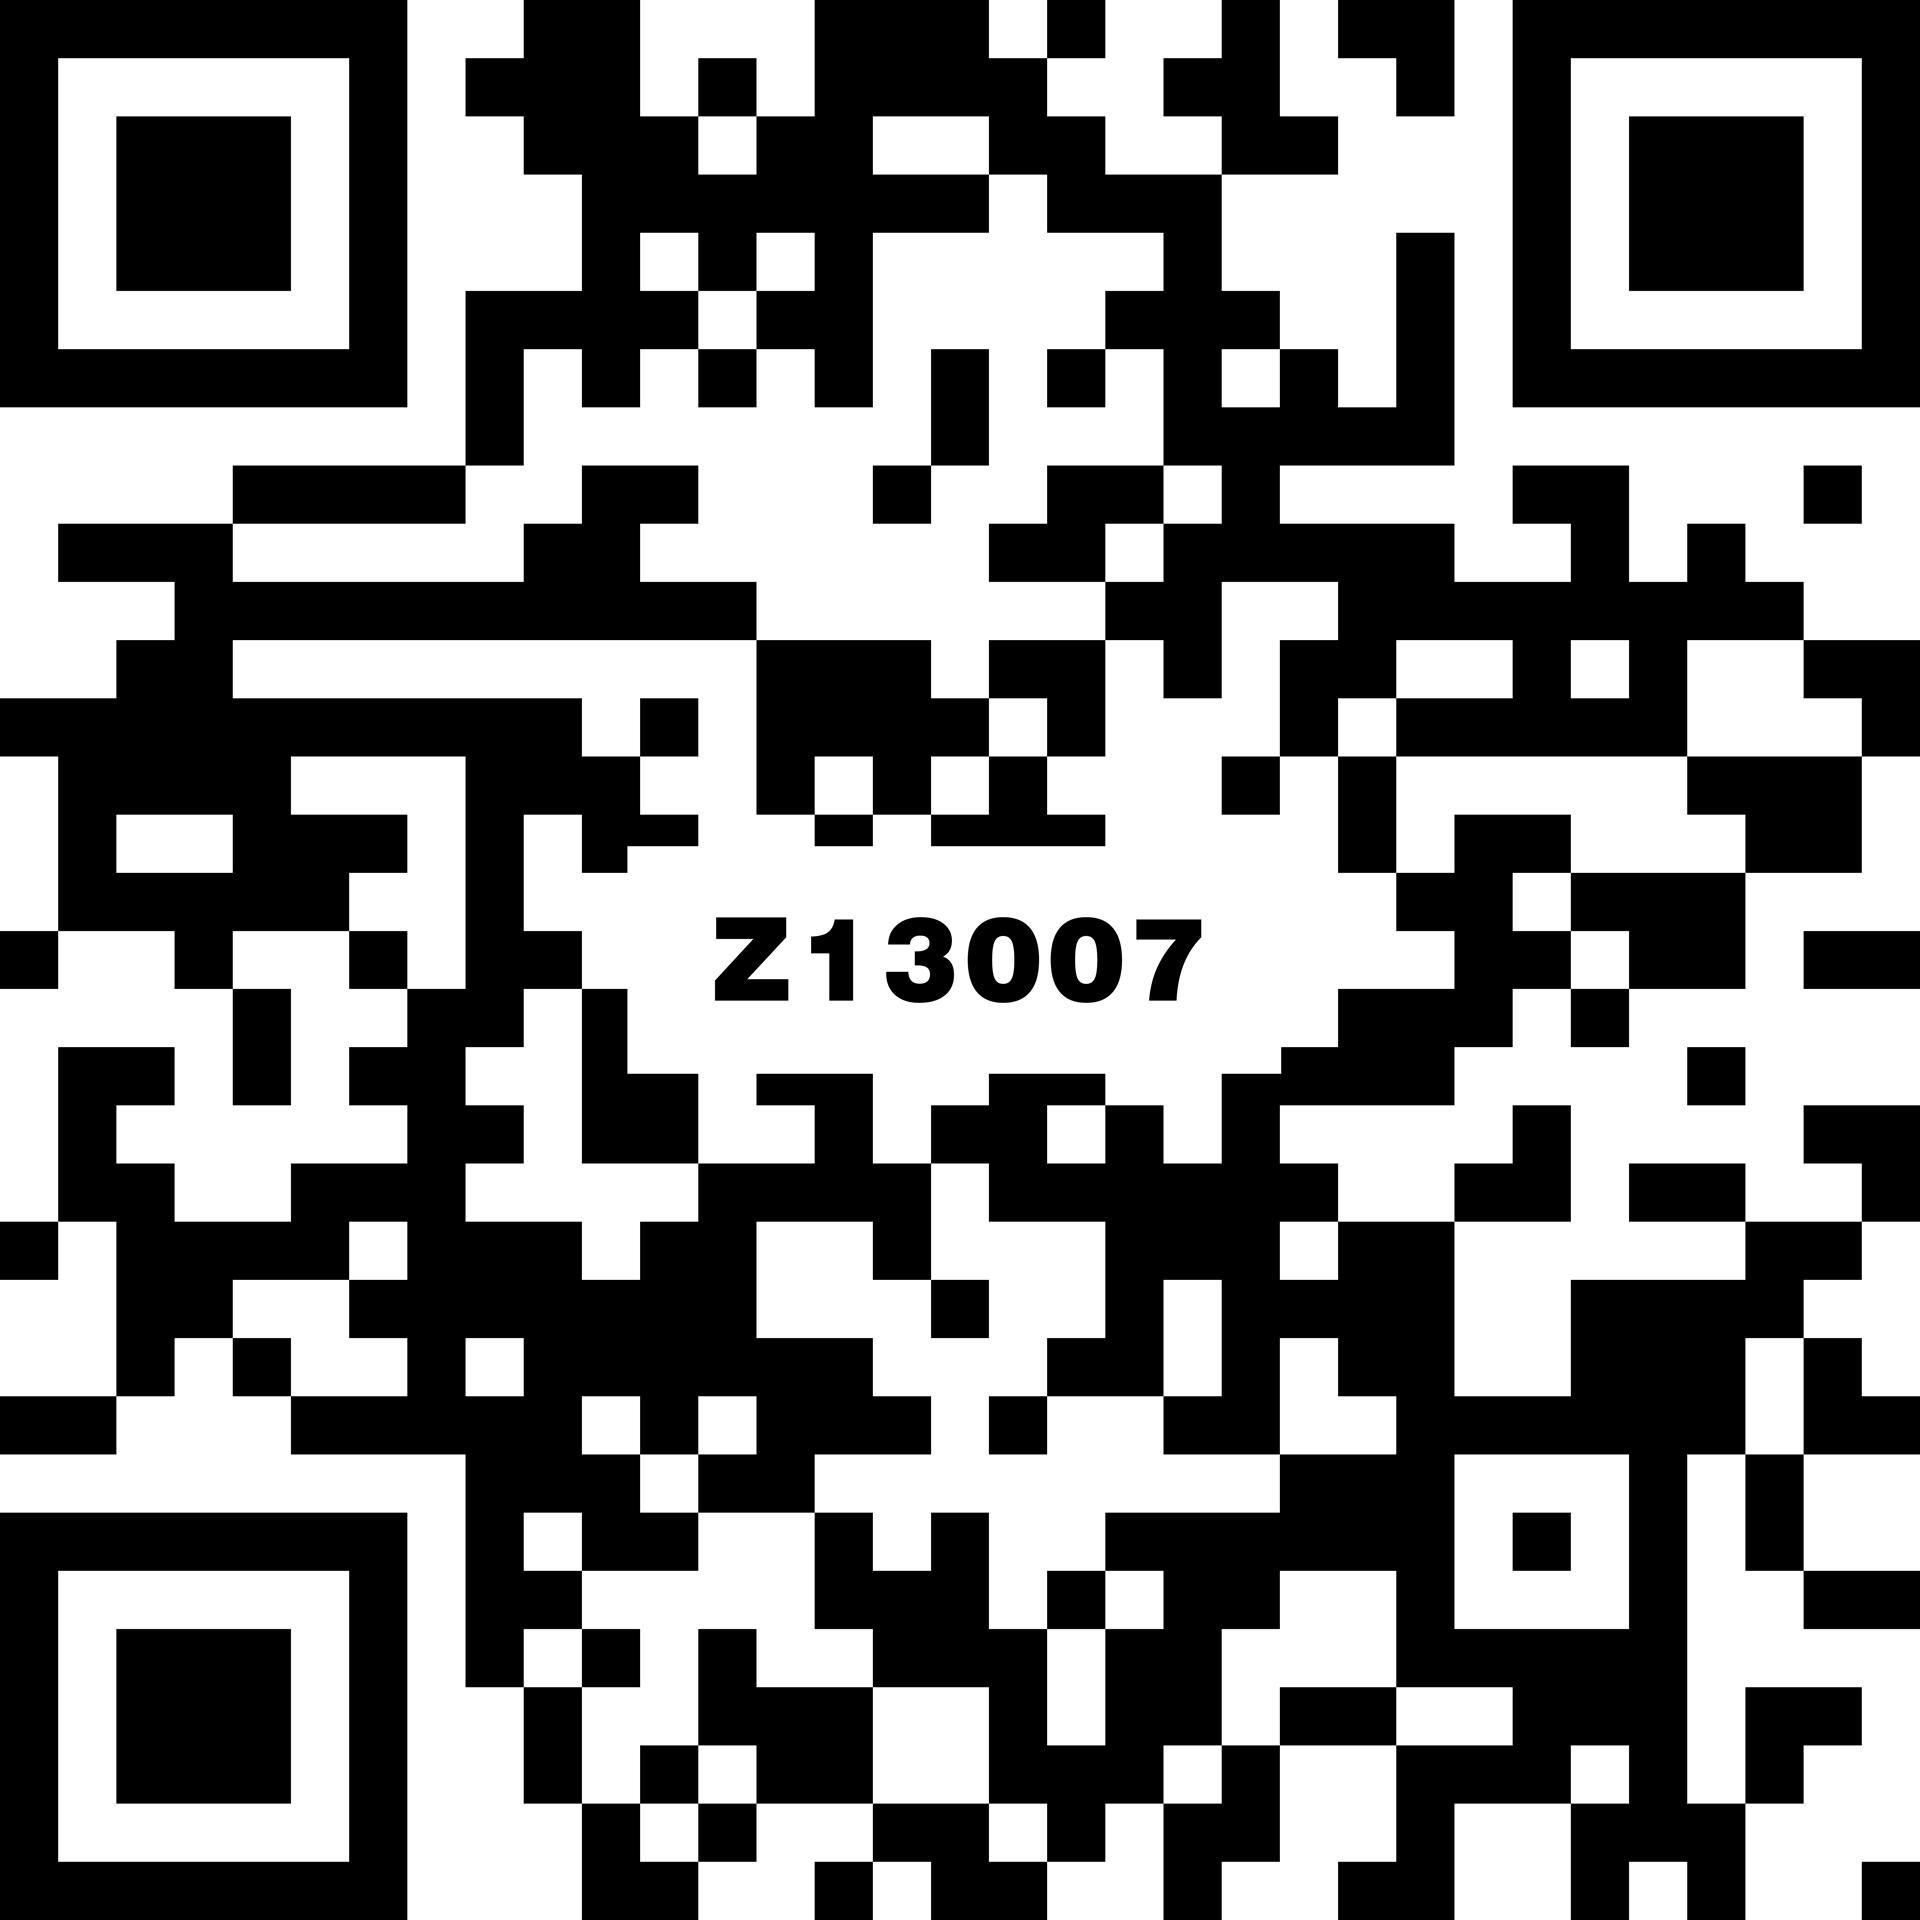 Z13007